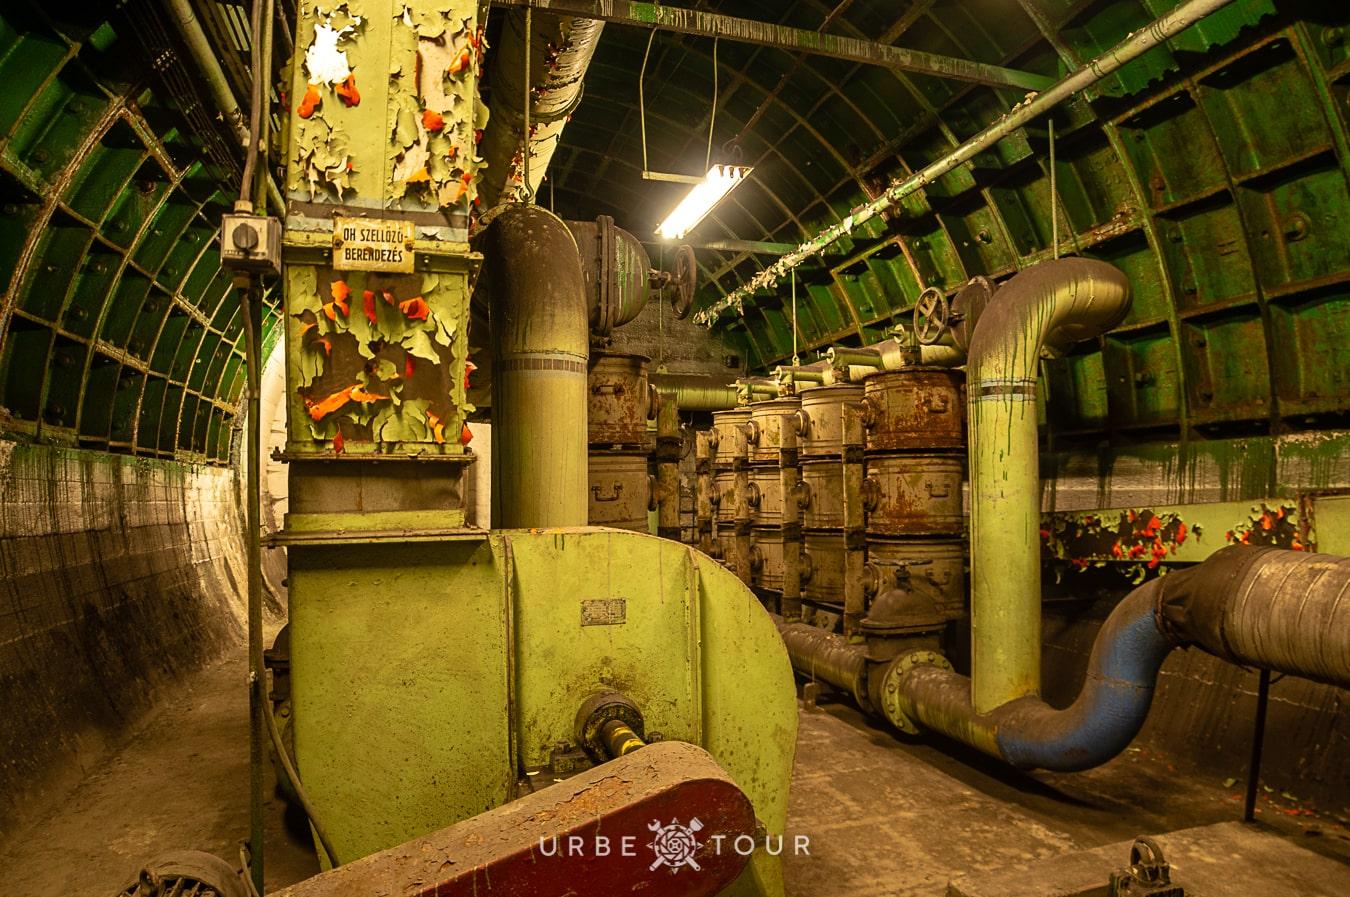 F-4-Rakosi-Bunker-budapest-7 Спецобъект Ф-4 - бункер коммуниста Ракоси в центре Будапешта